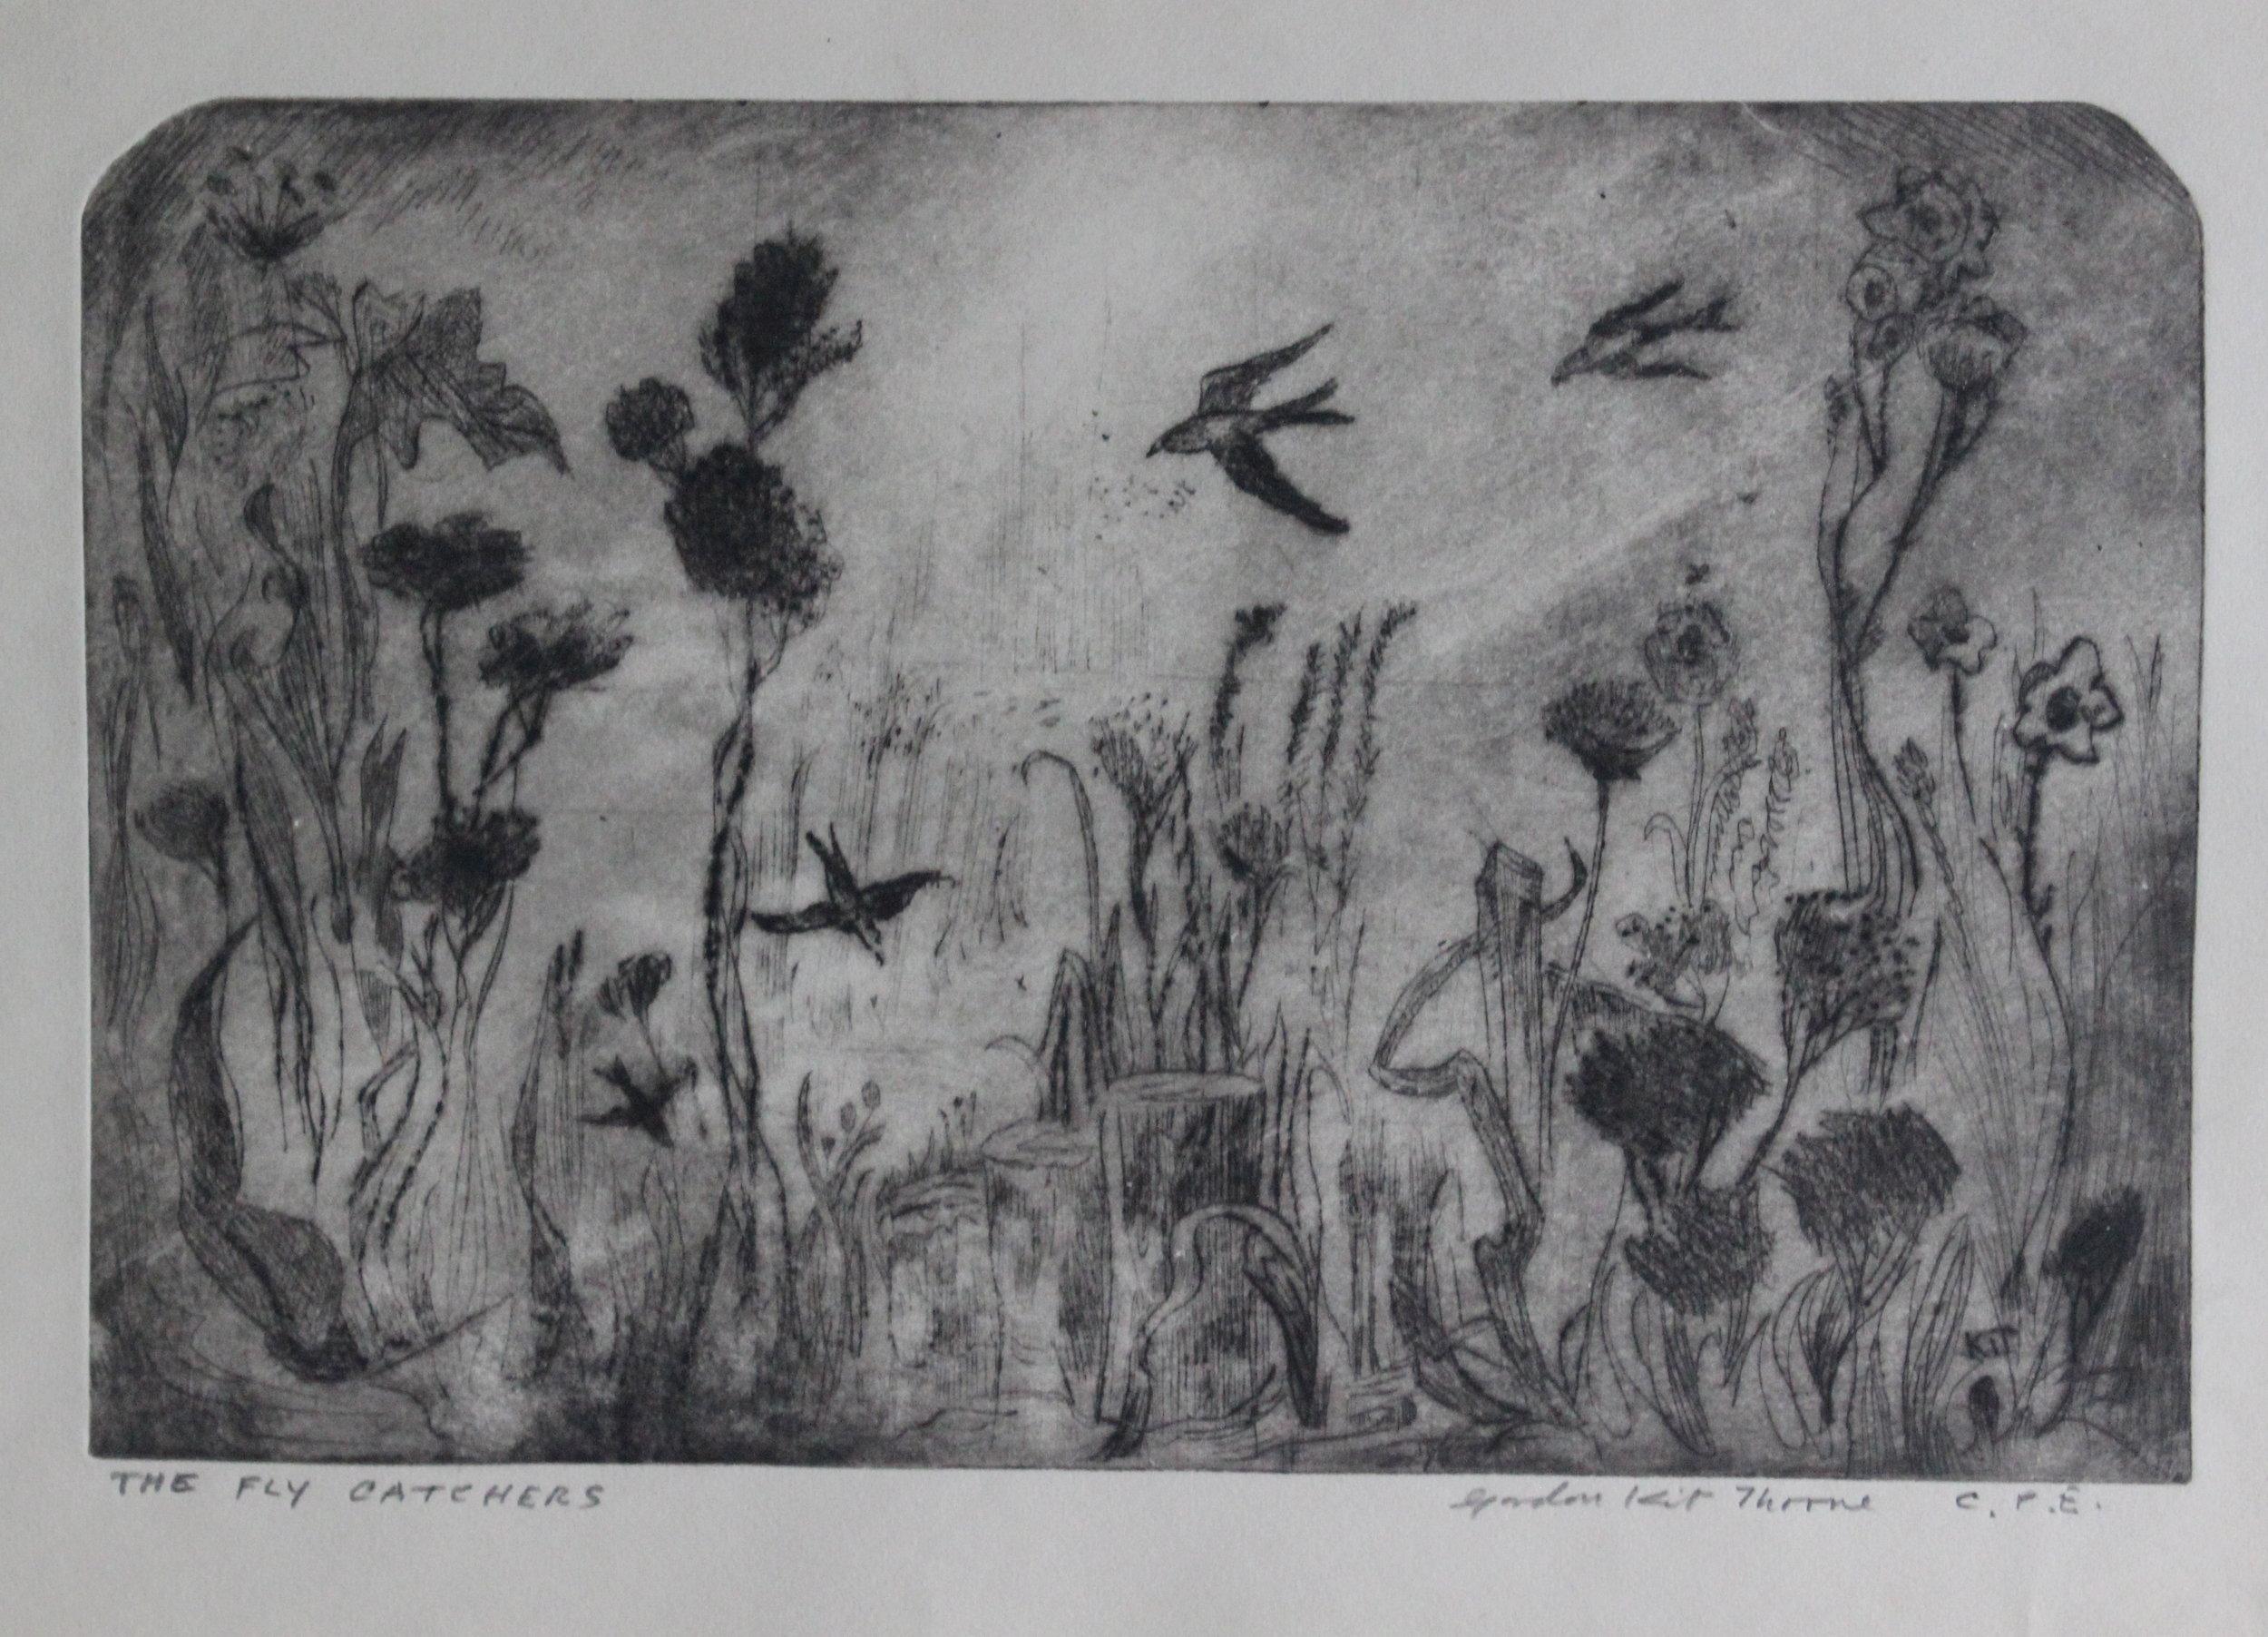 Gordon Kit Thorne, The Fly Catchers